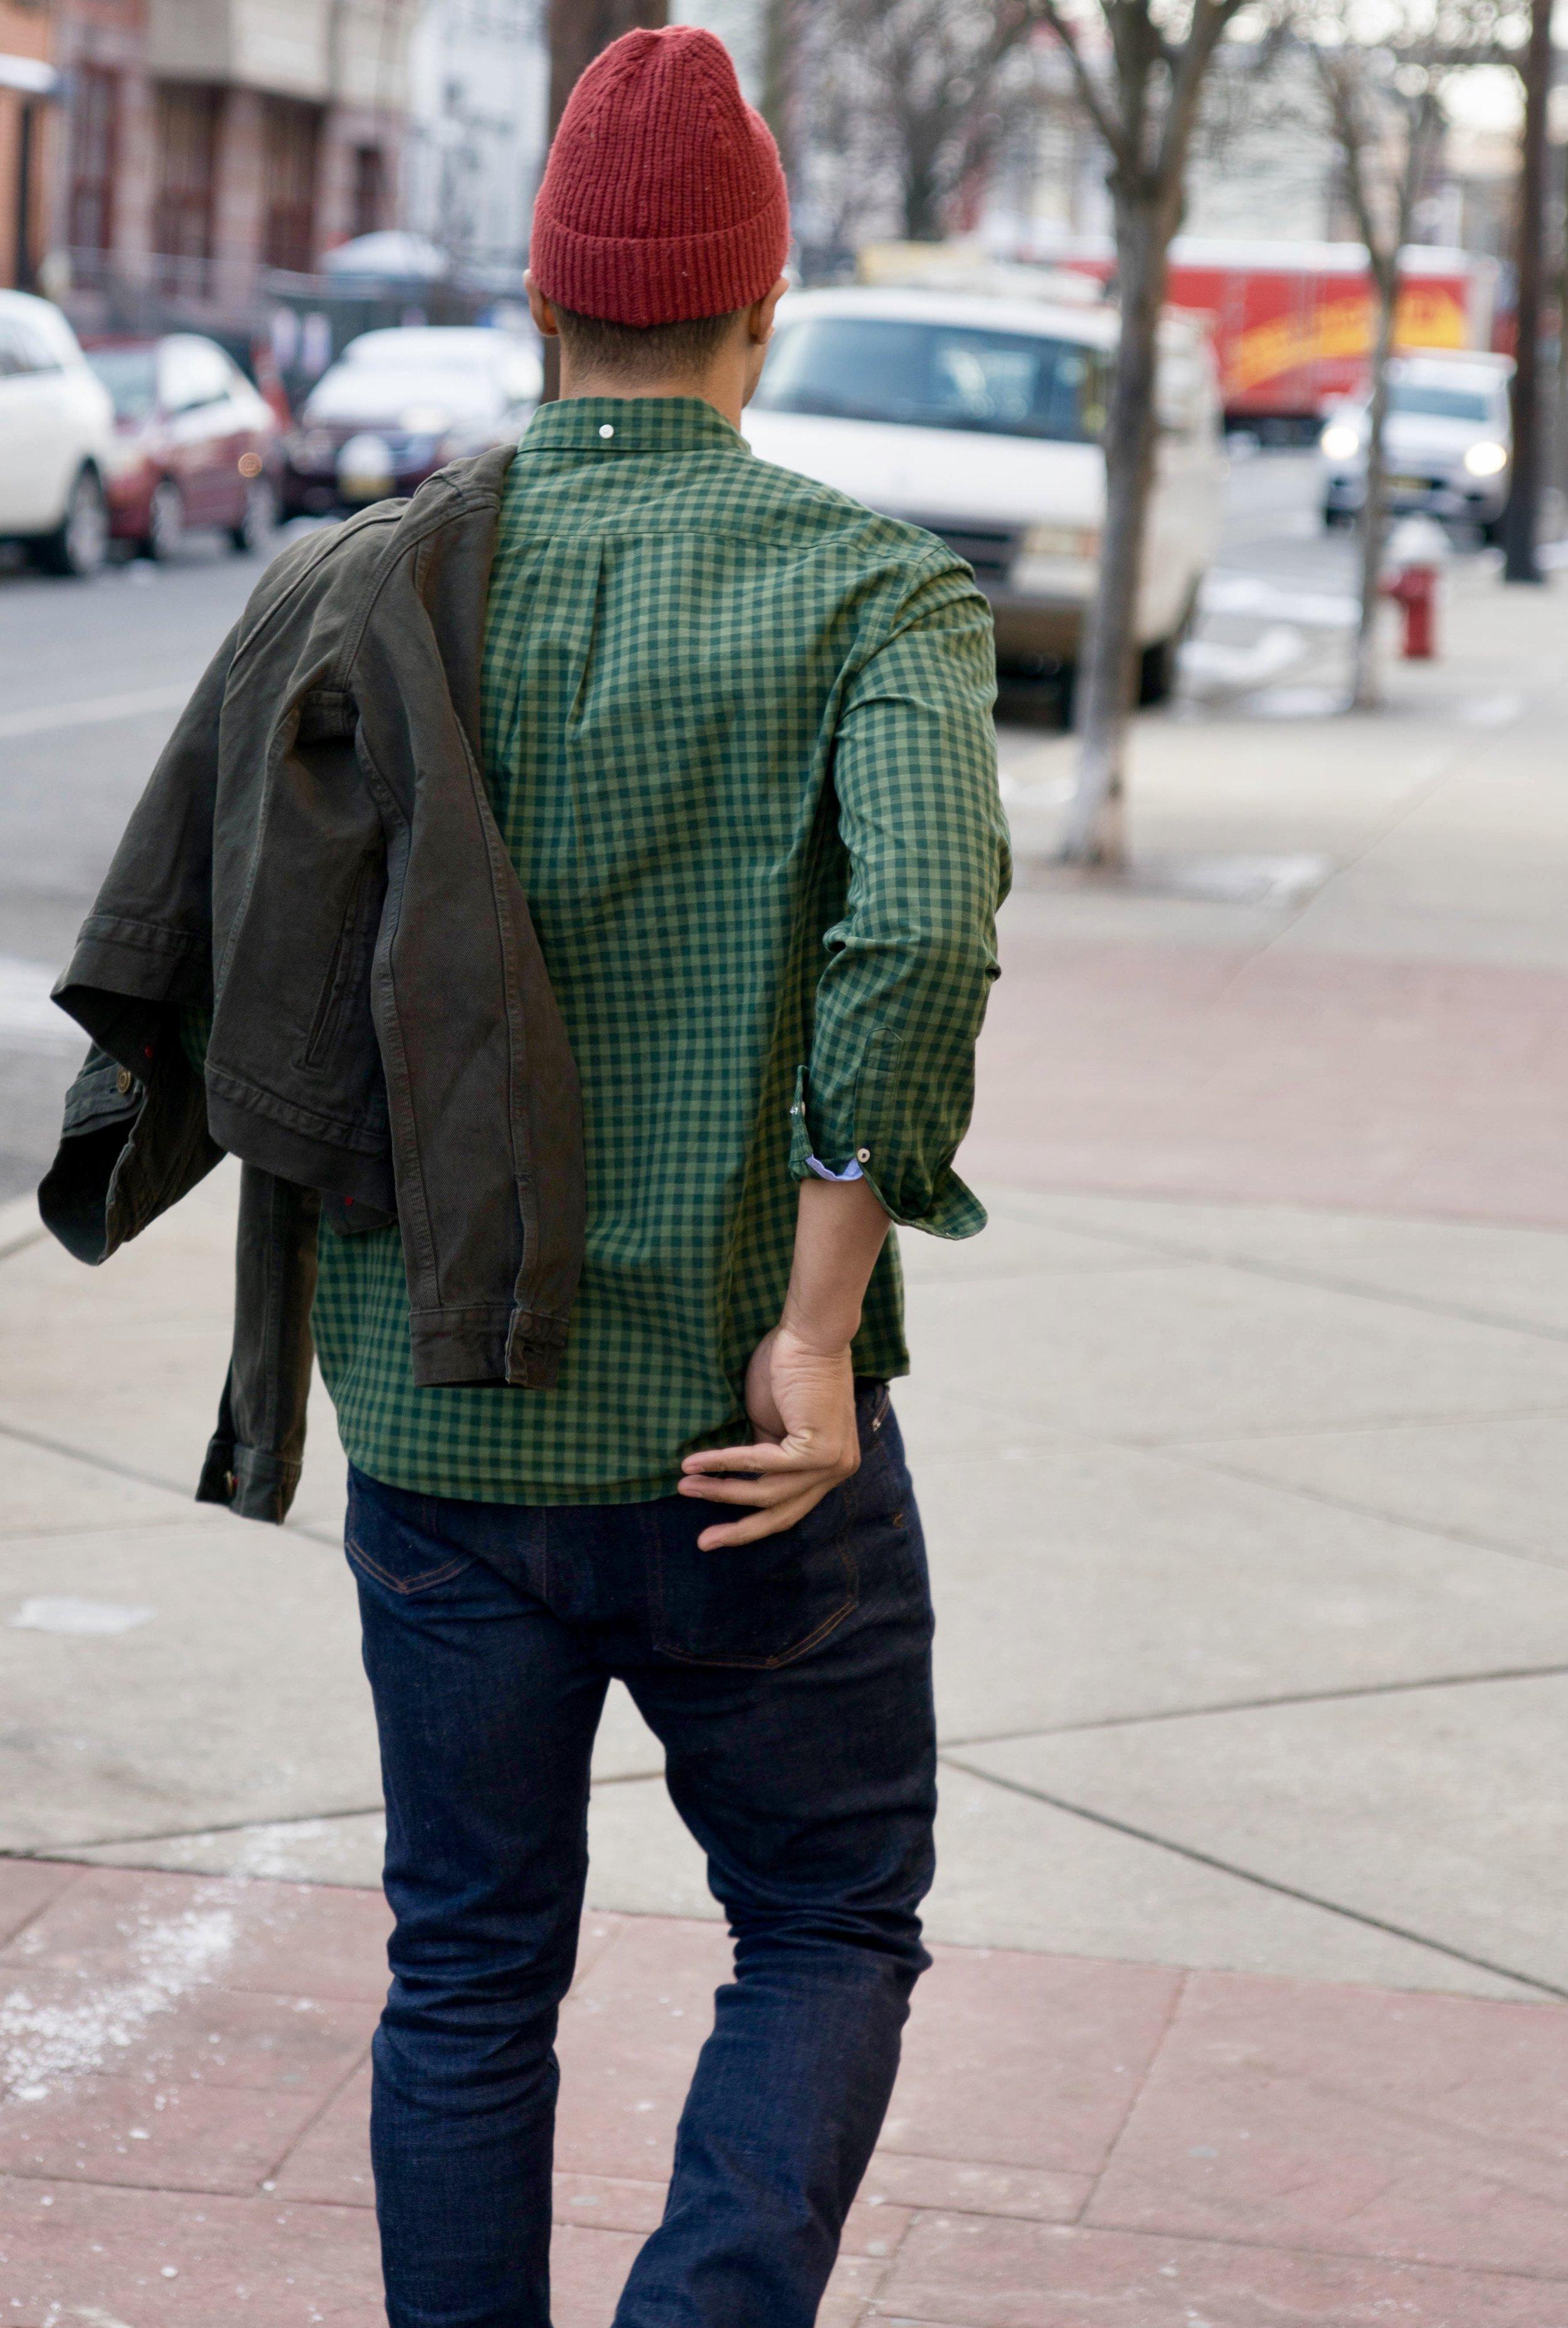 Dress It Up or Dress It Down - Men's Classic Fit Casey Check Print & Men's Garment Dyed Denim Jacket